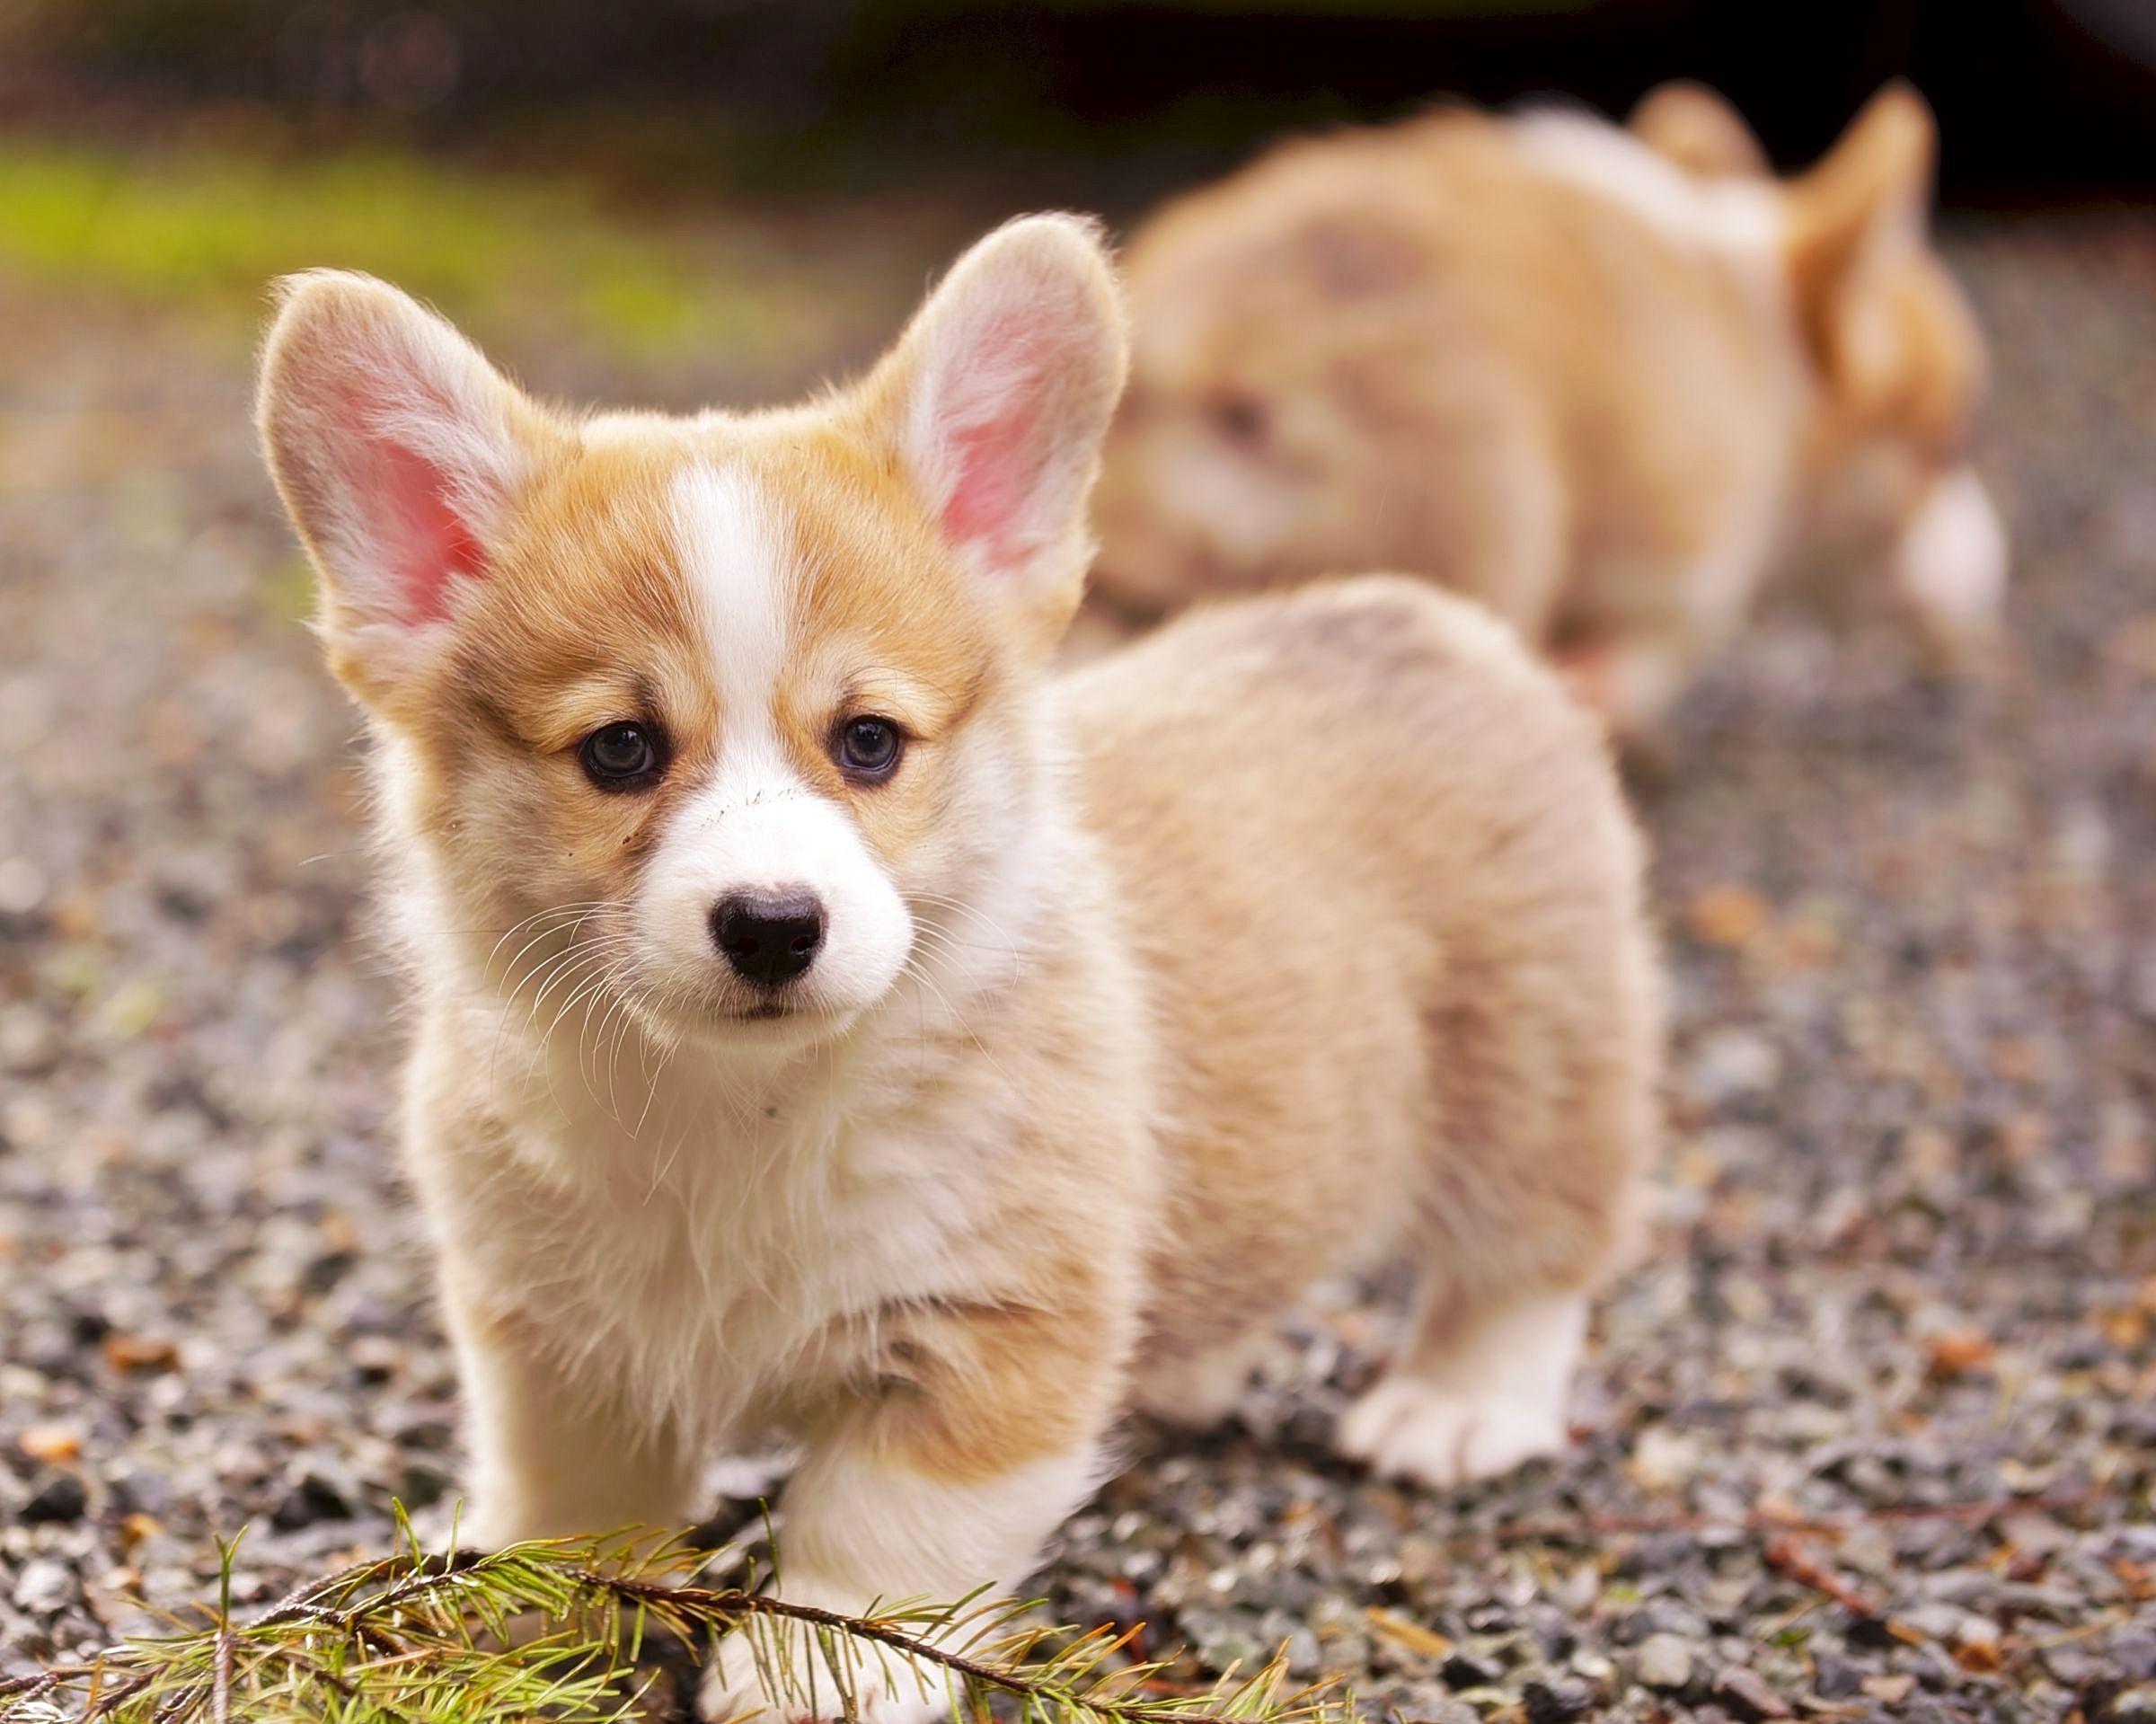 Attack Of The Adorable Corgi Puppies Cute Baby Animals Com Welsh Corgi Puppies Baby Corgi Corgi Dog